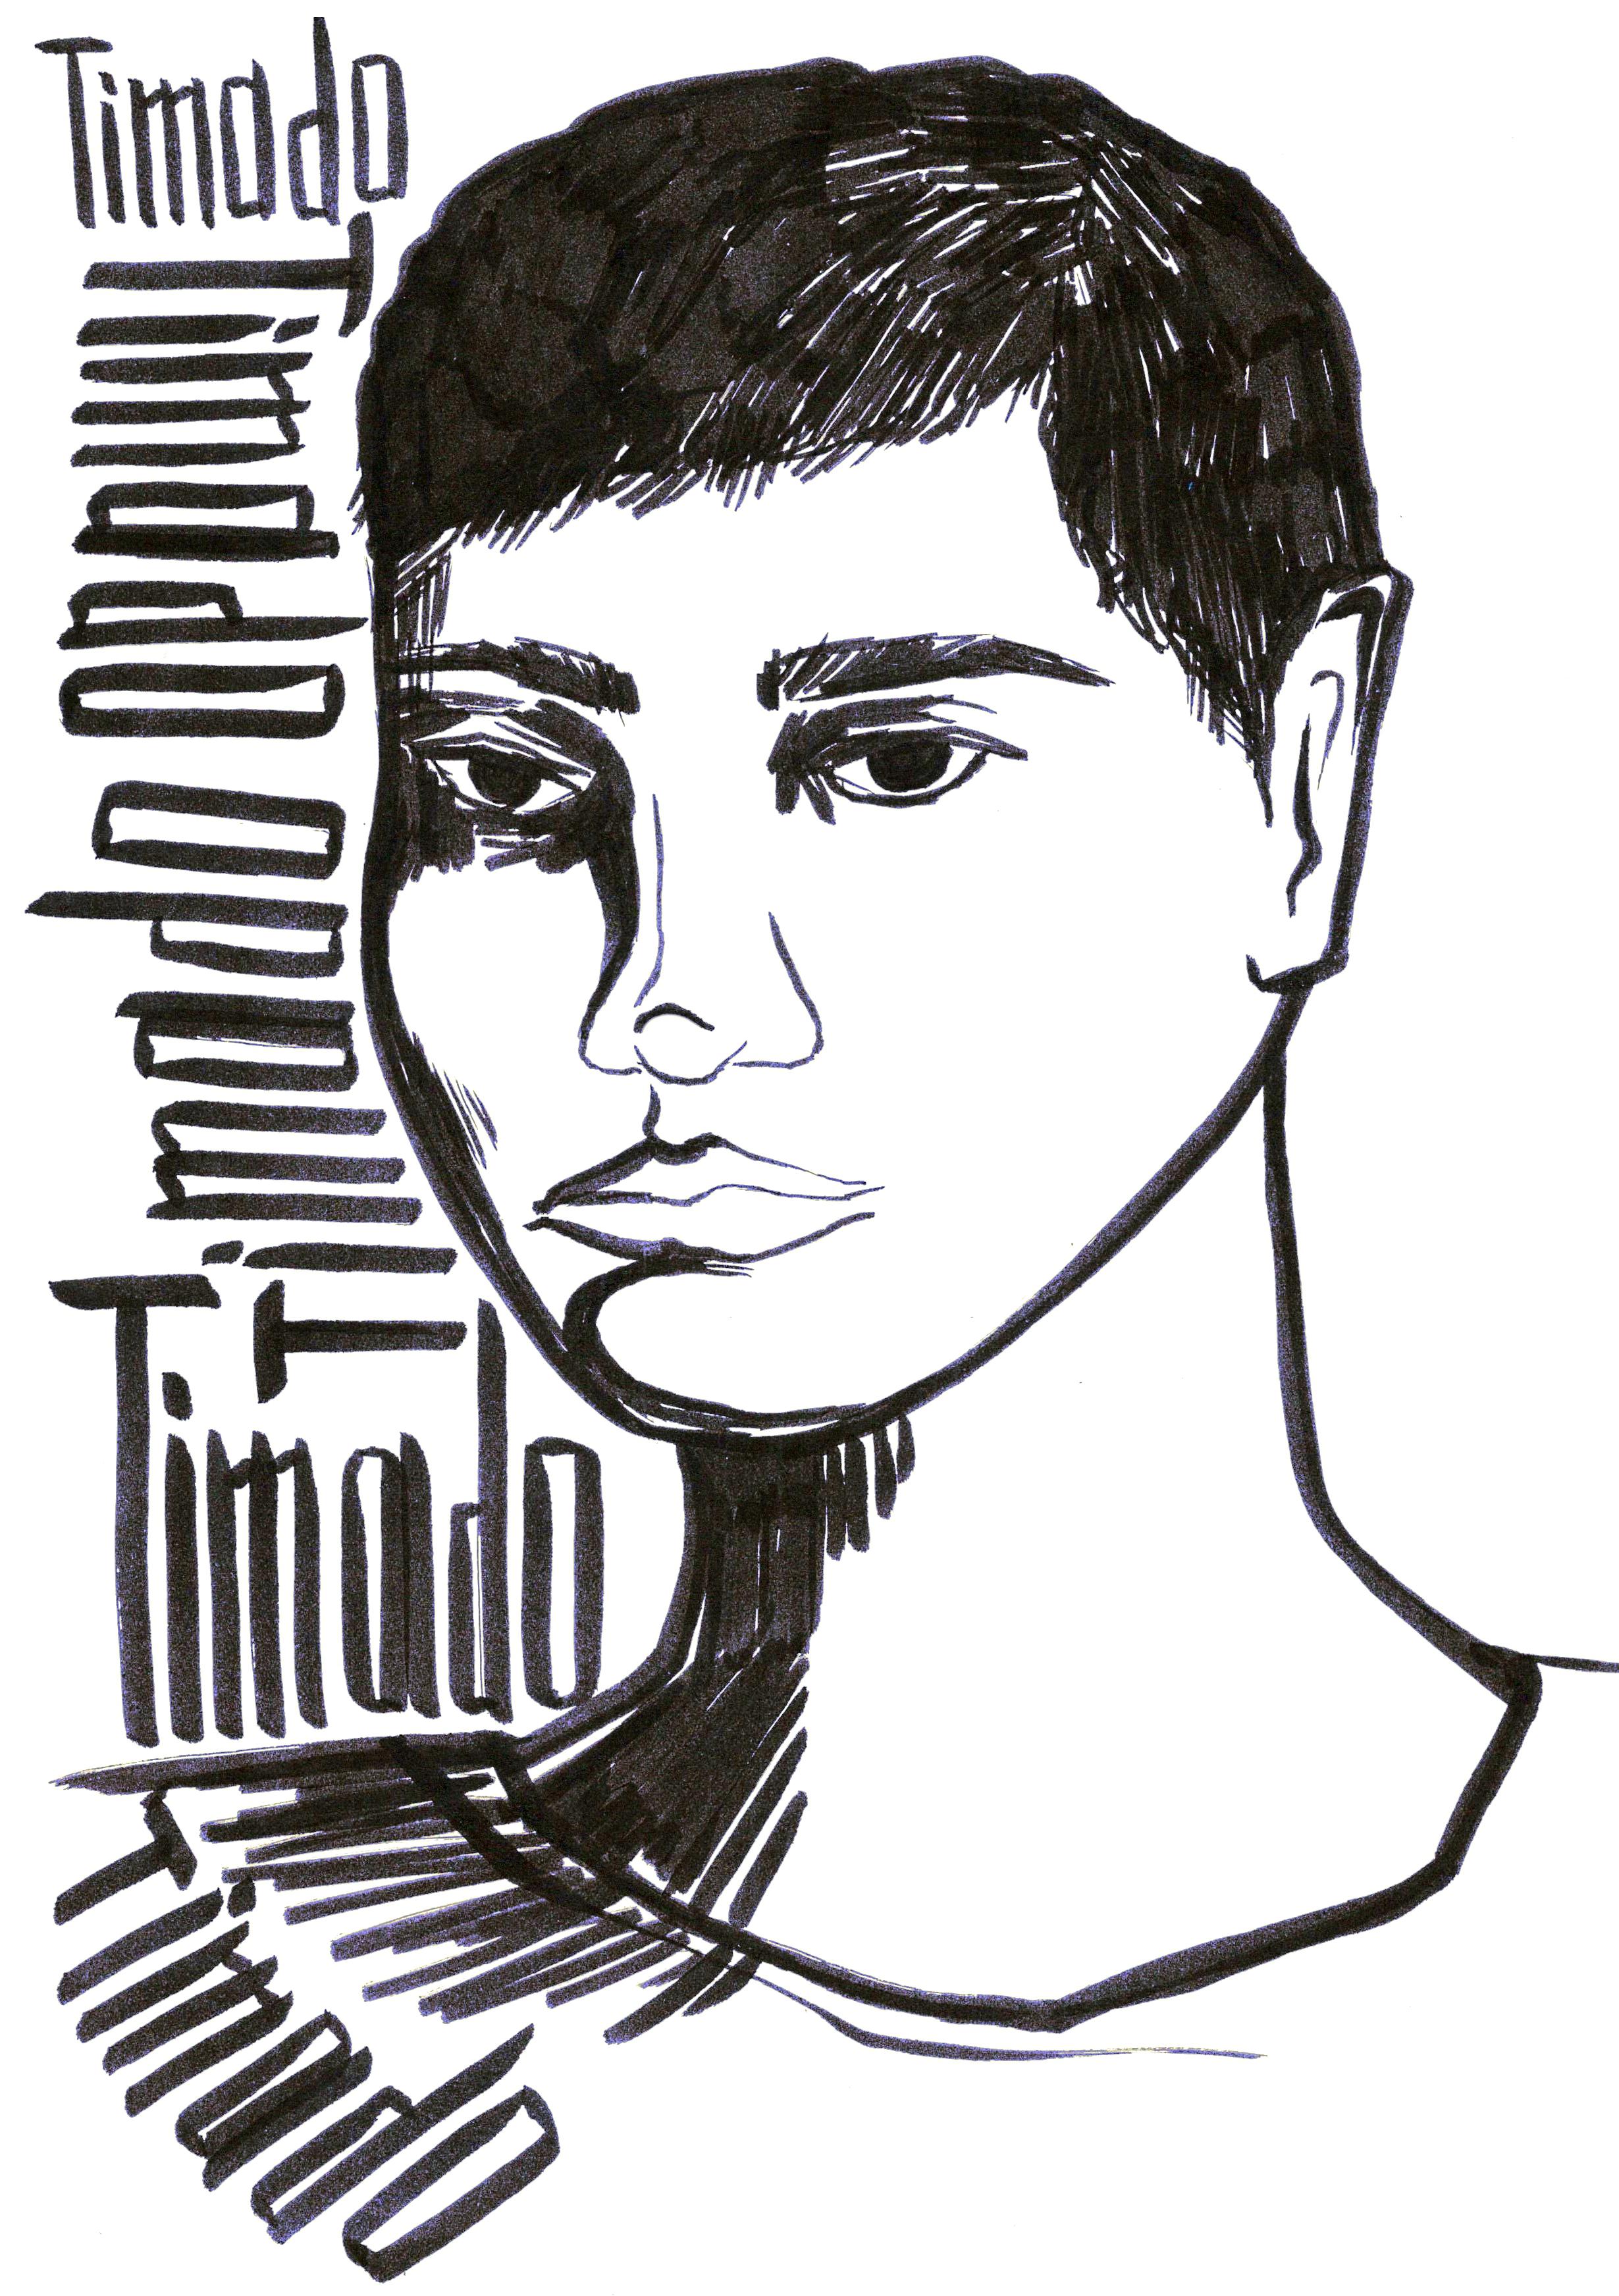 Энцо «Timado» Джианоли, Интервью, Infamous